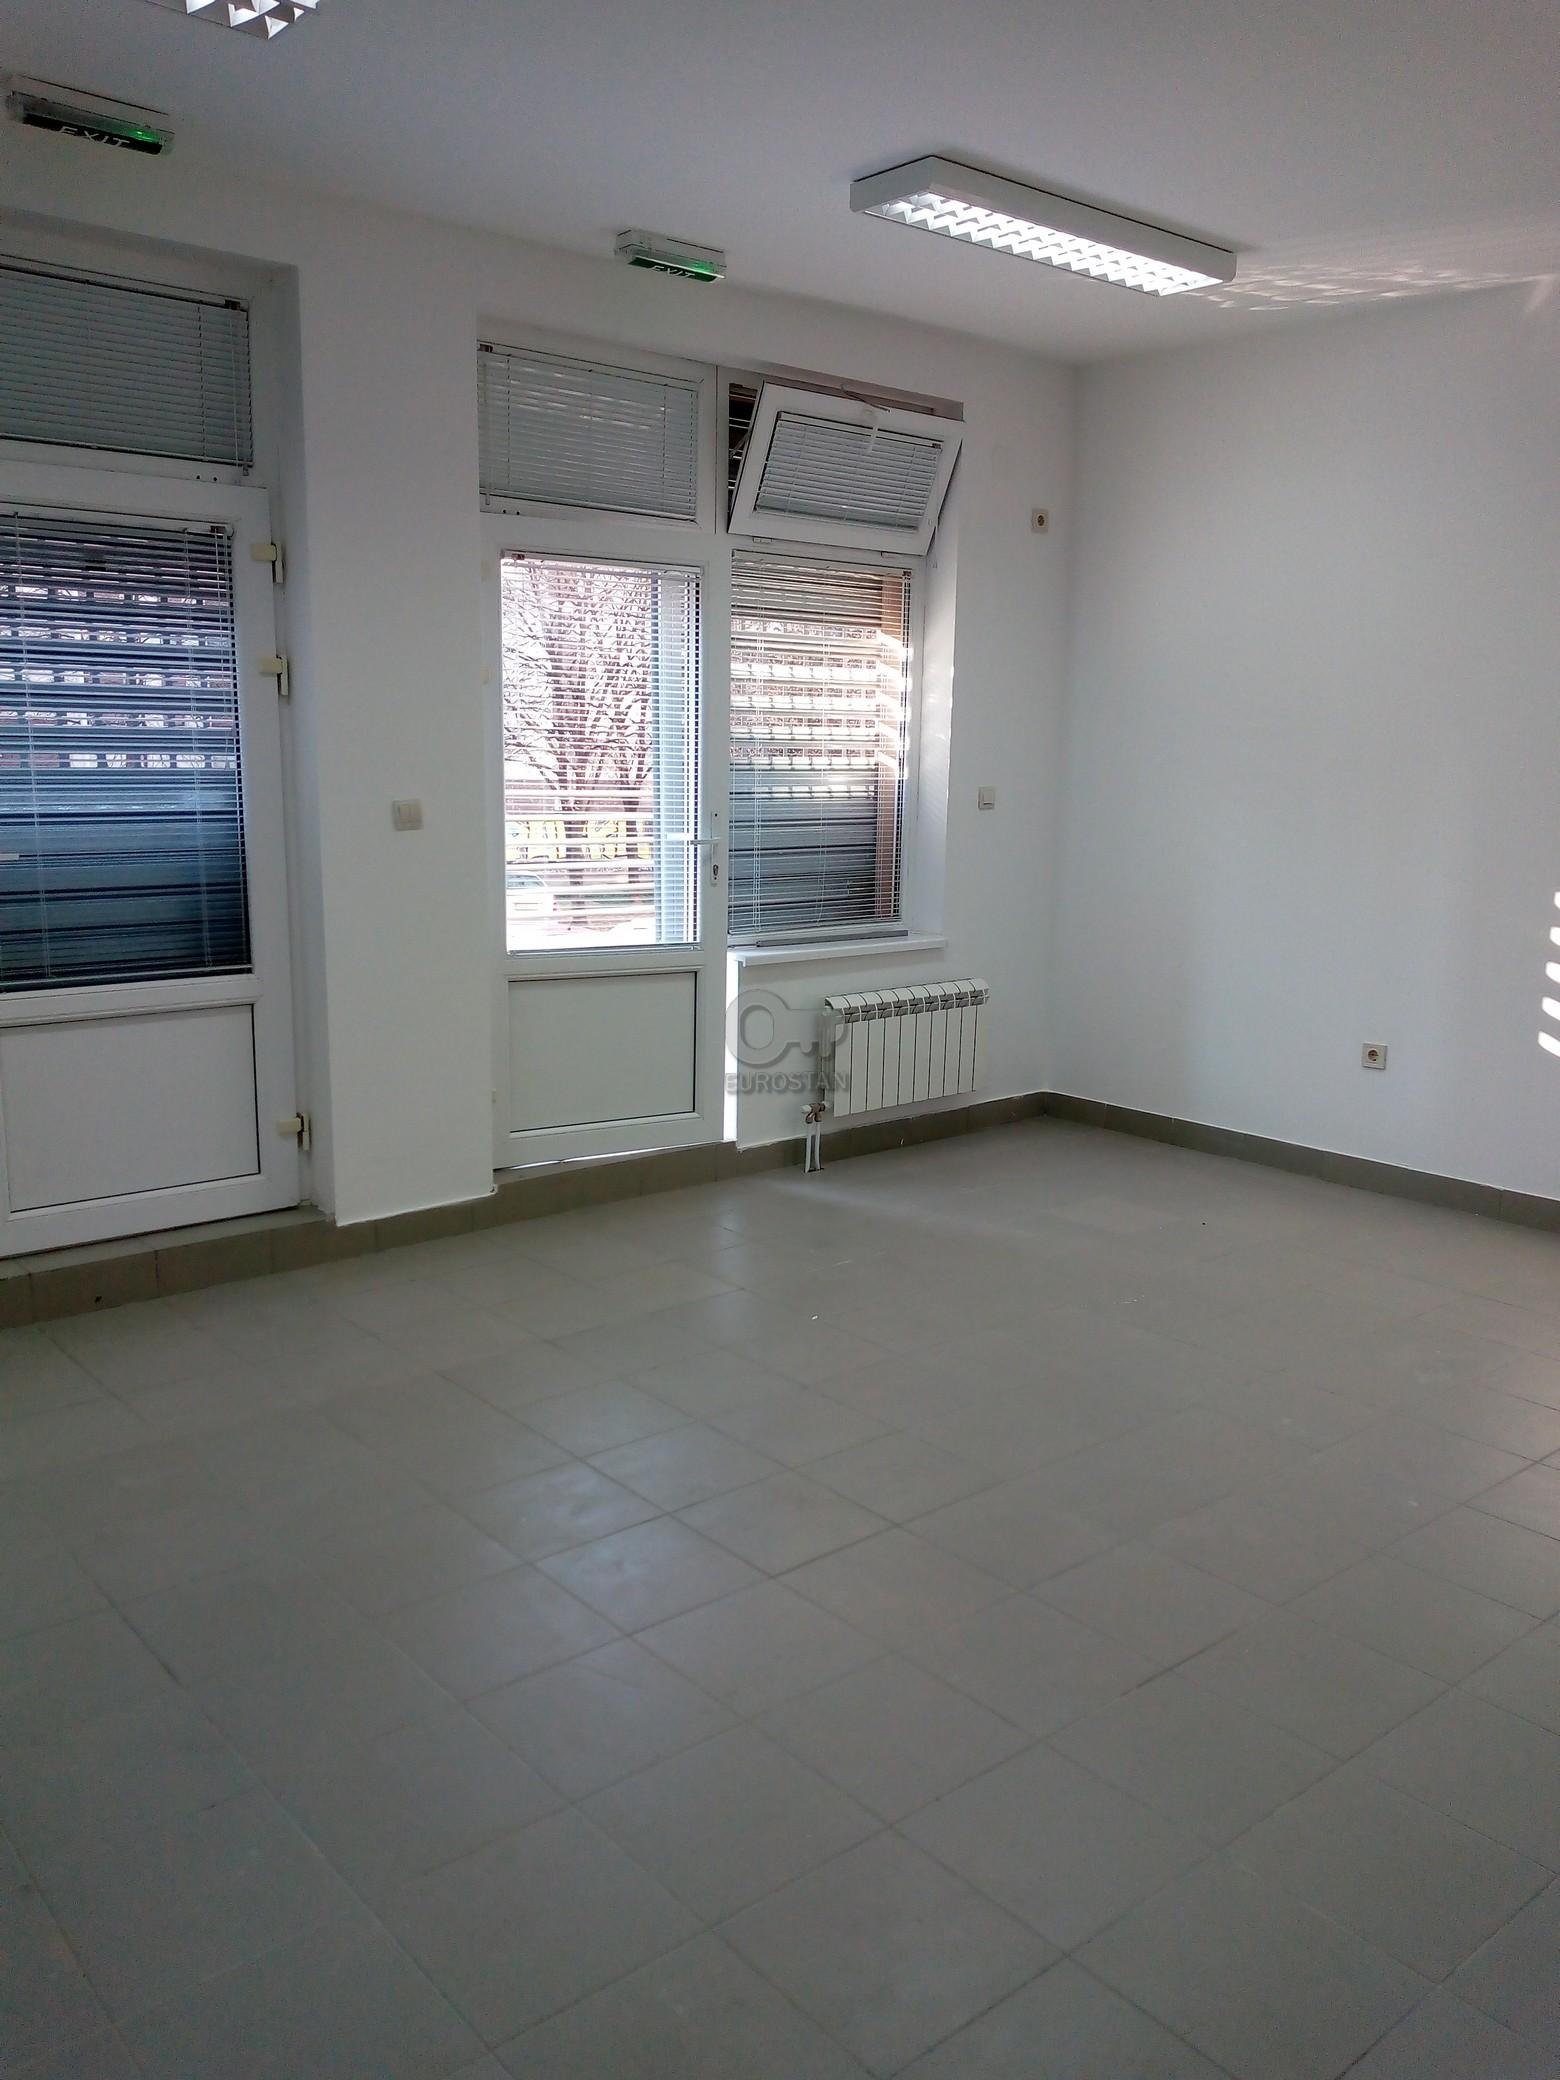 Poslovni prostor CERAK 250 EUR